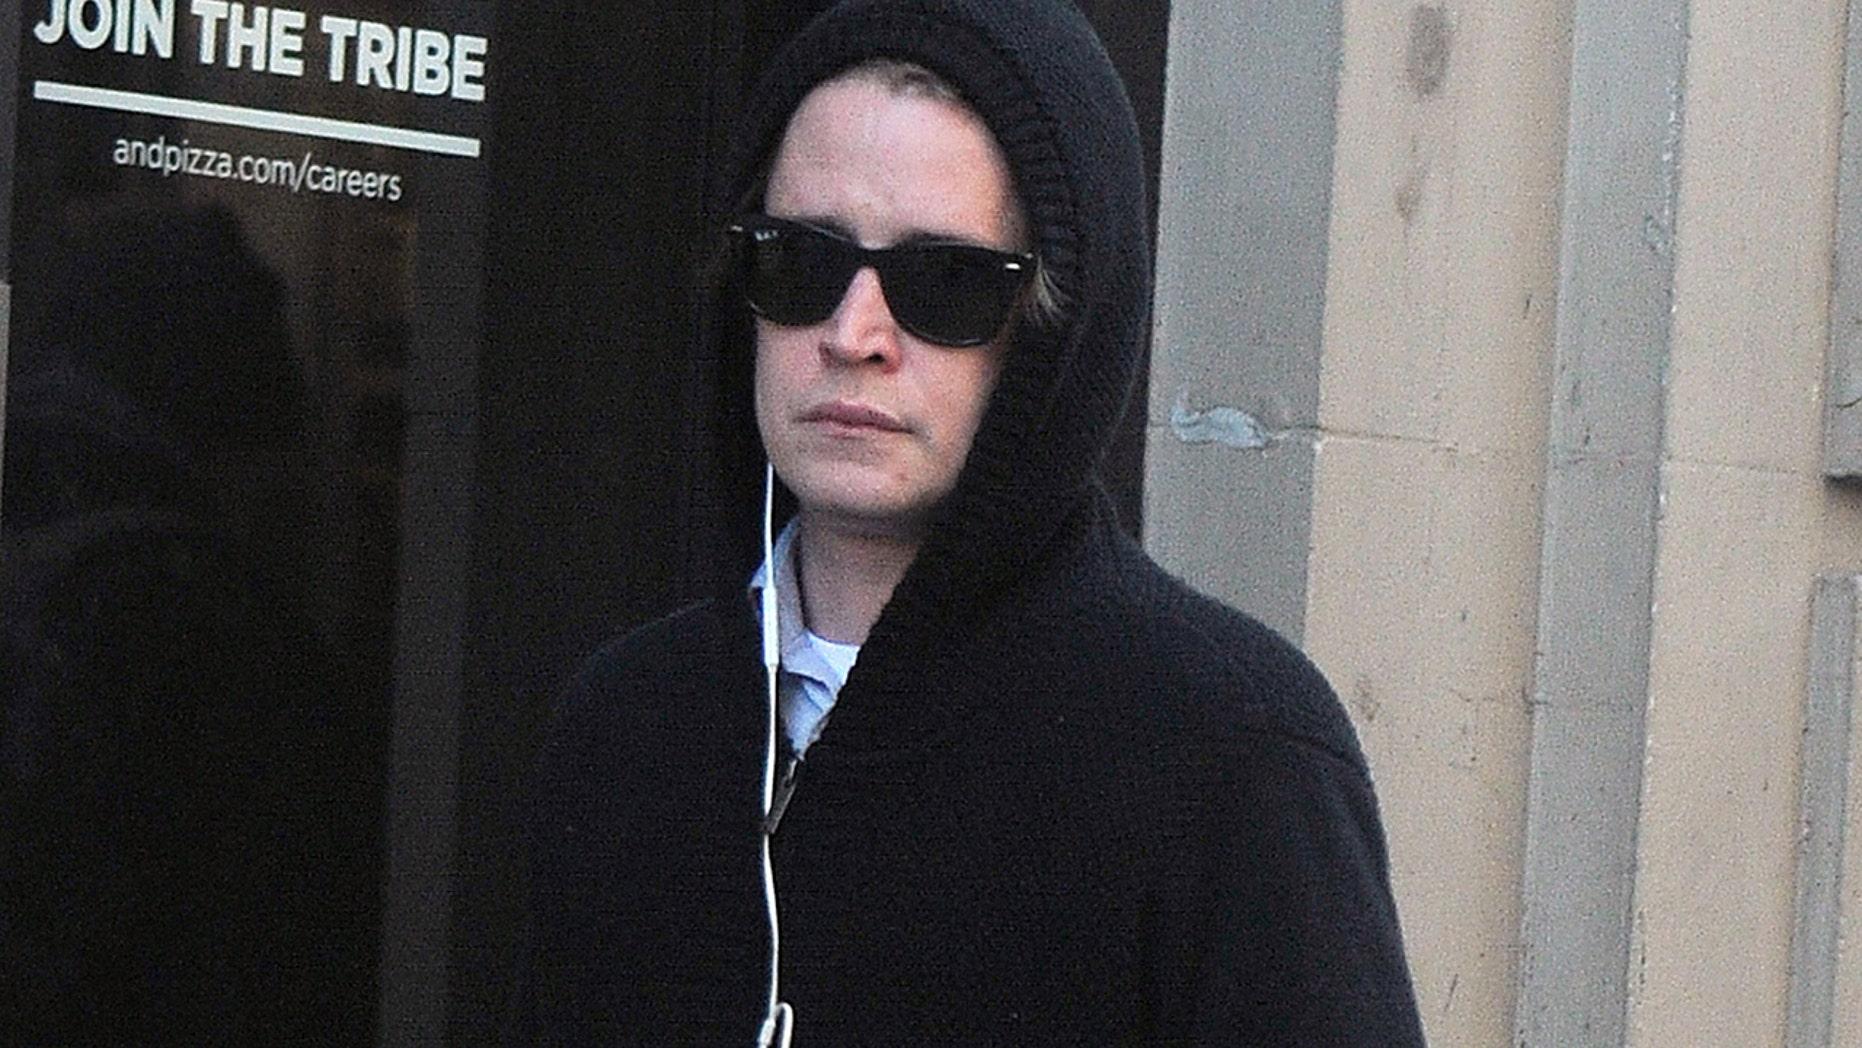 Macaulay Culkin seen on the streets of  Manhattan on January 18, 2018 in New York.